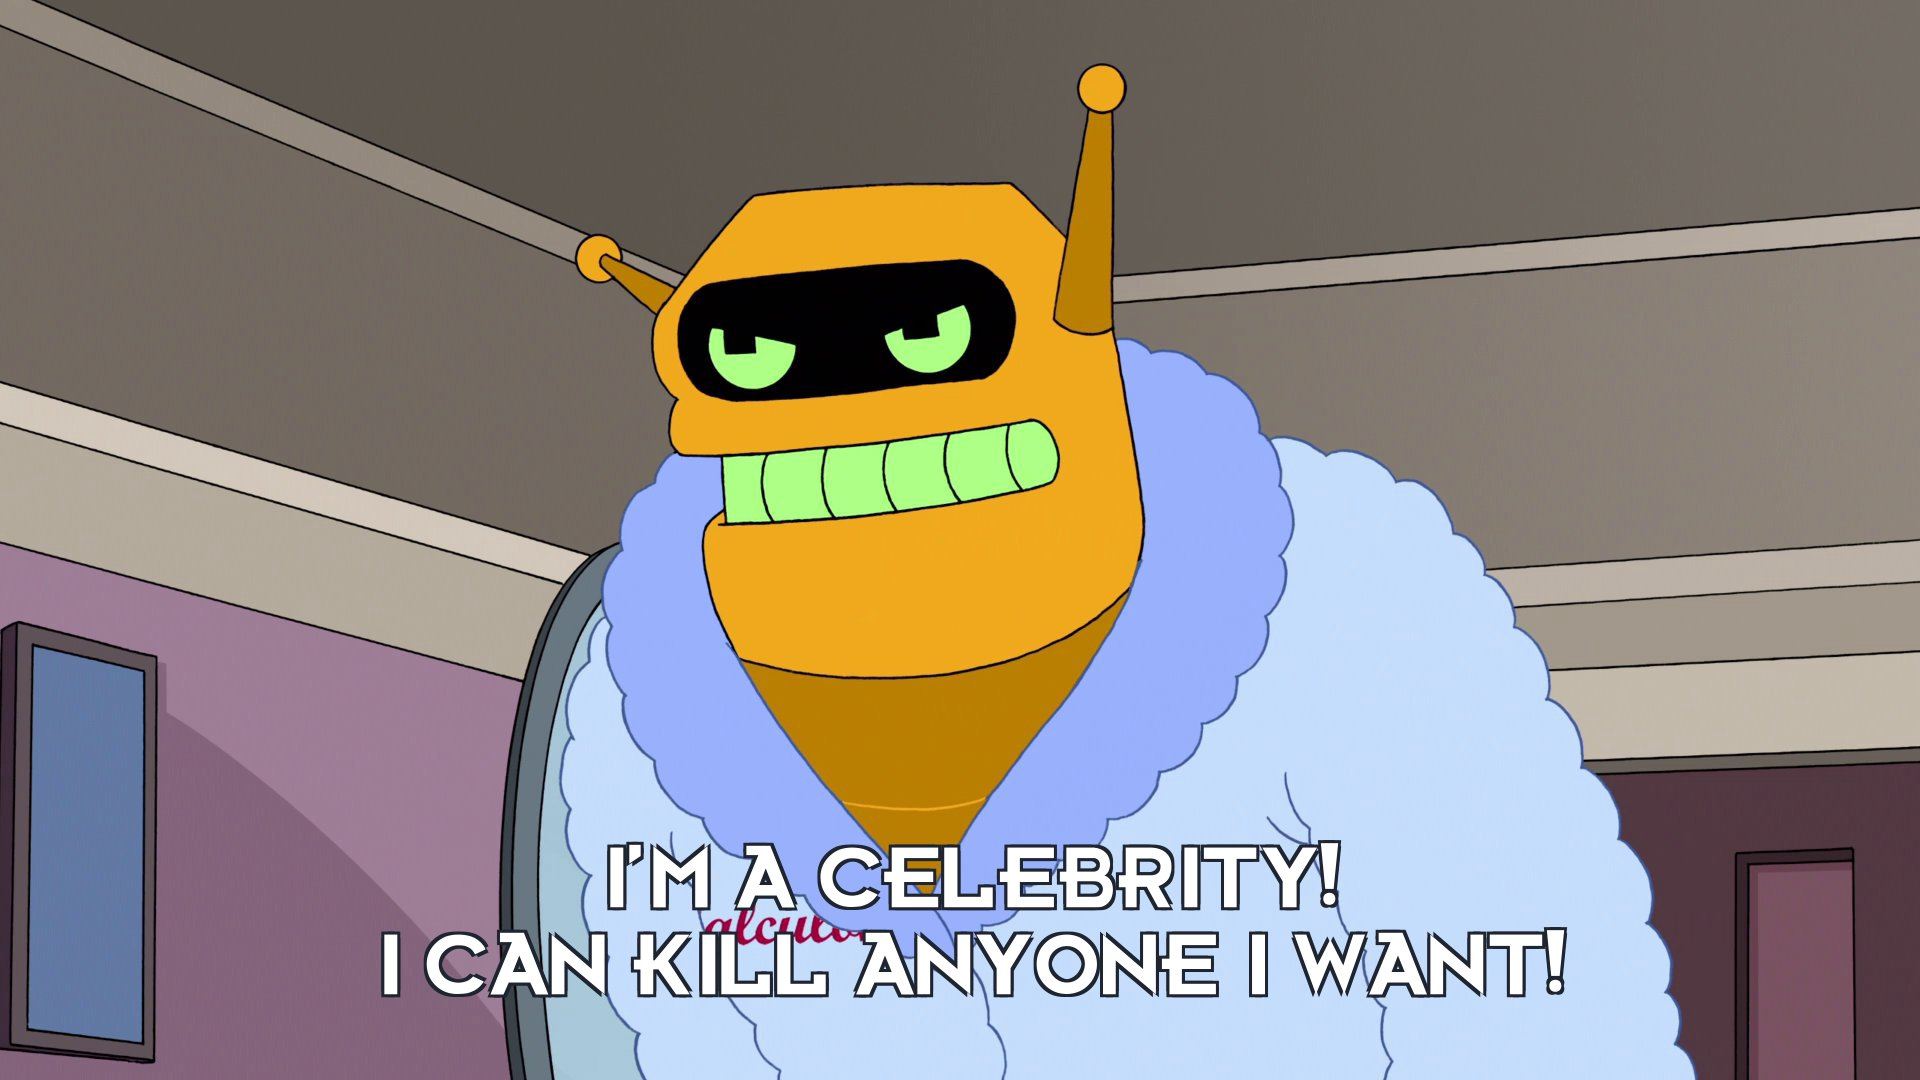 Calculon: I'm a celebrity! I can kill anyone I want!